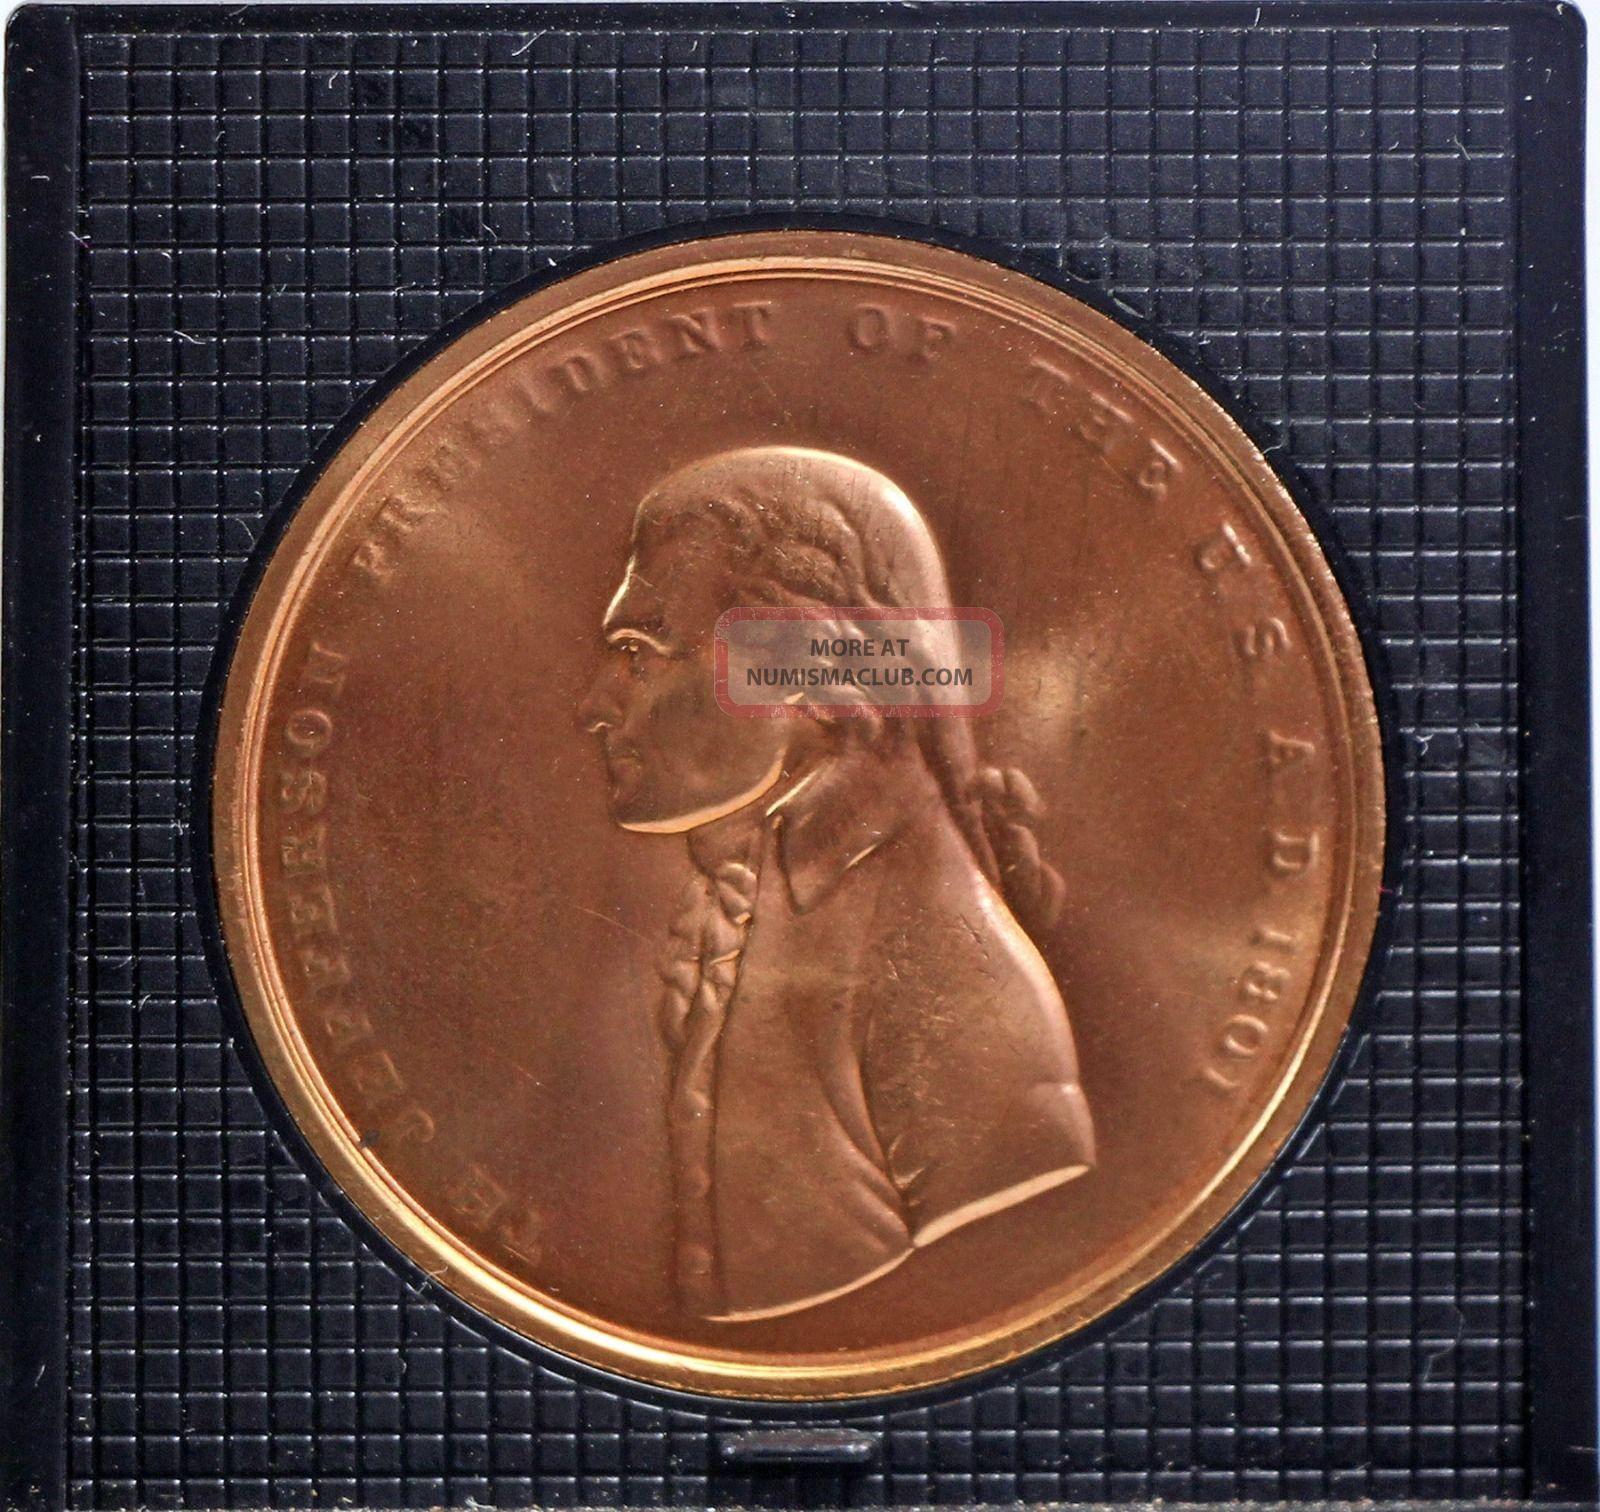 Thomas Jefferson Inagural Bronze Medallion - Peace Medal? Exonumia photo